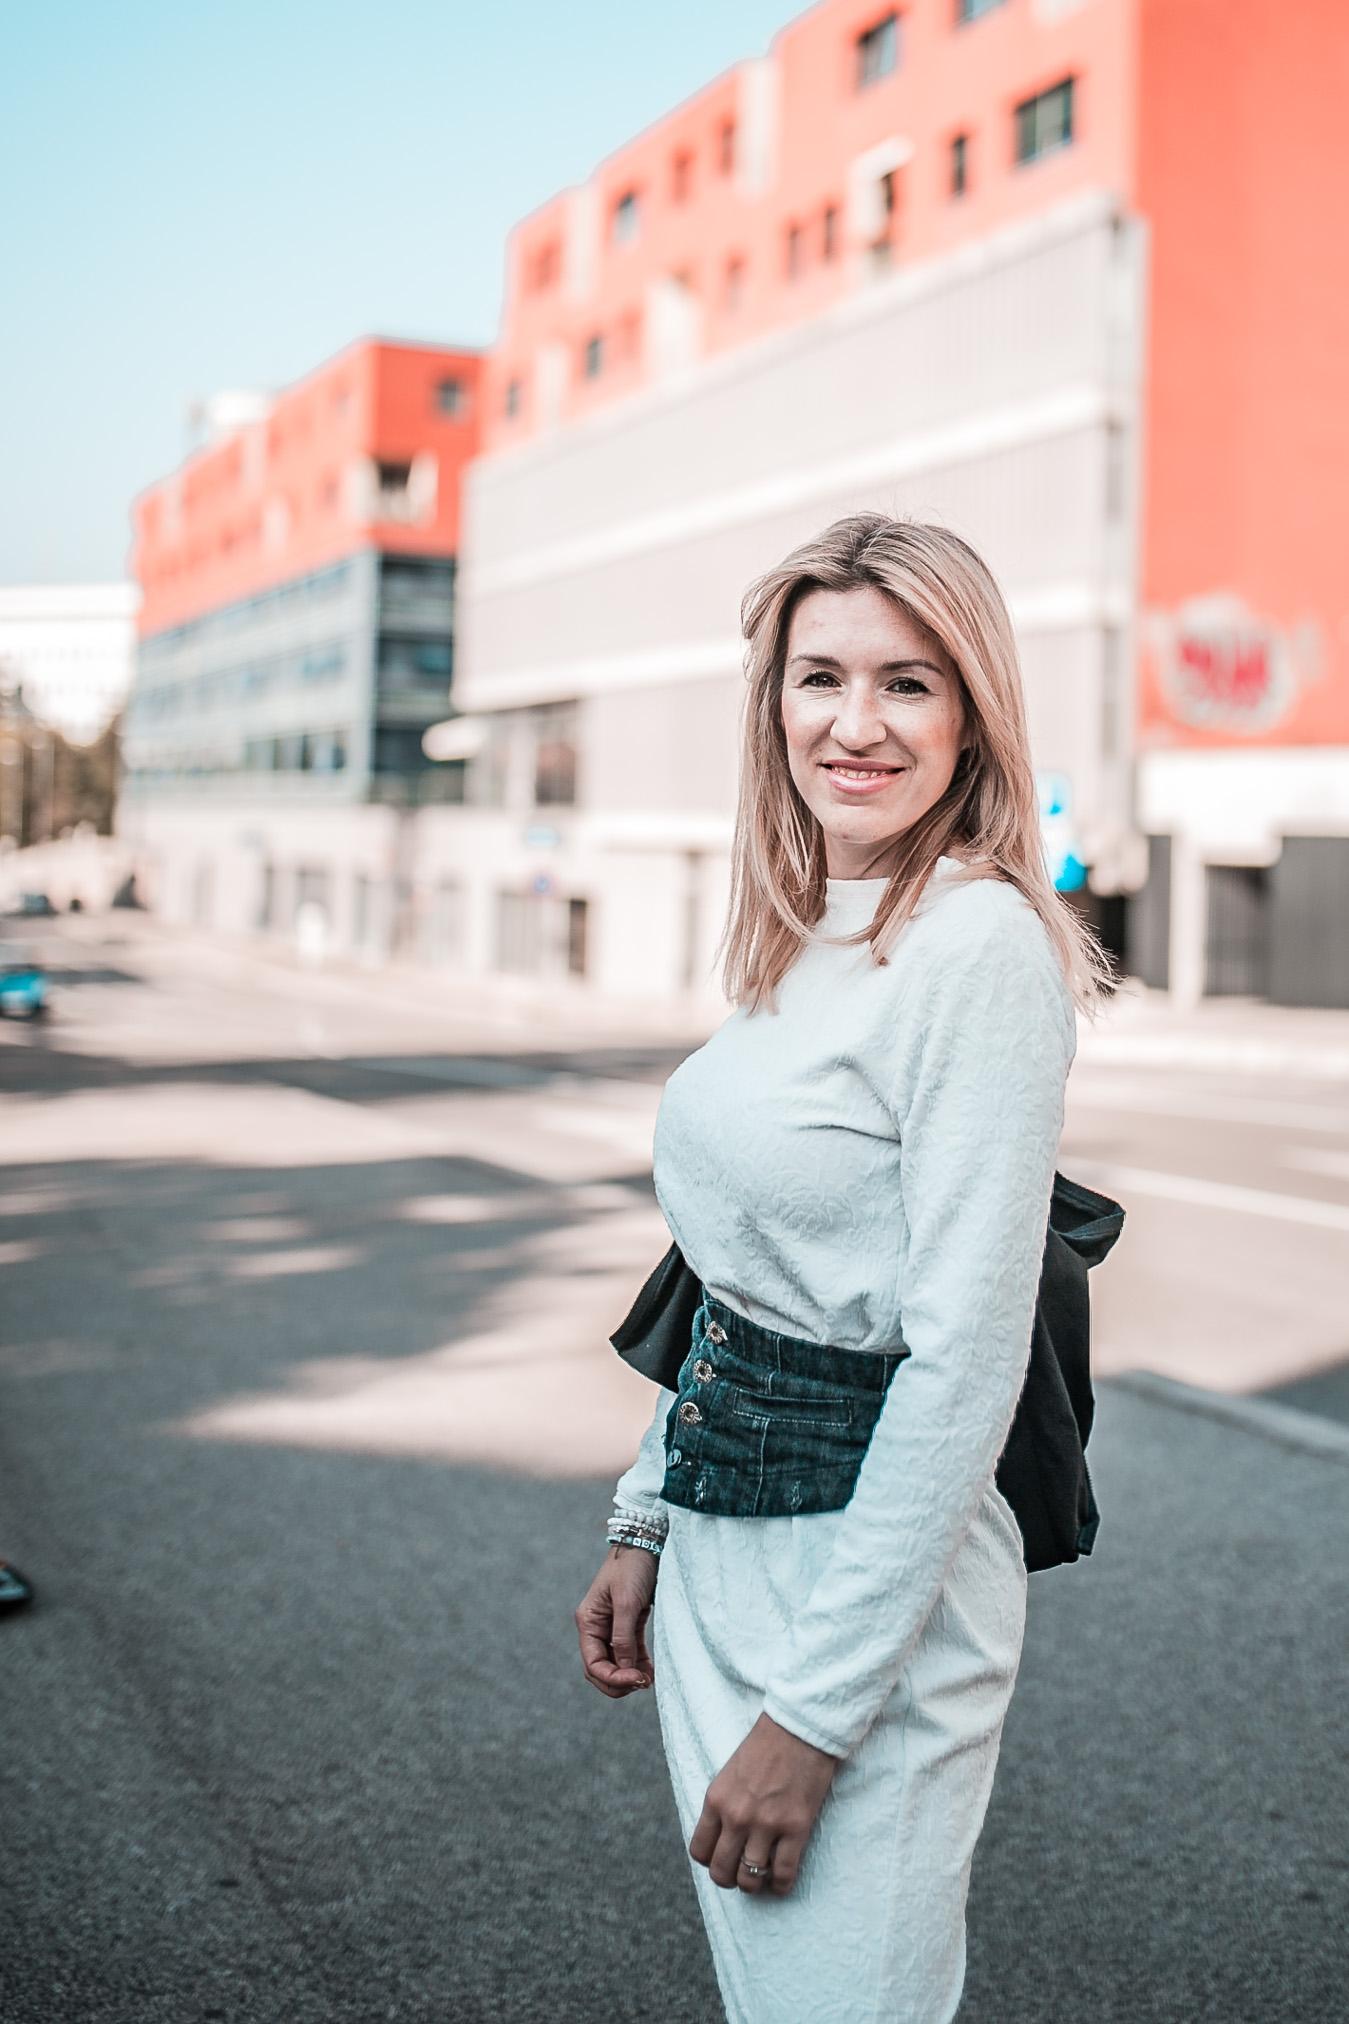 Razgovarala: Marija Klasiček